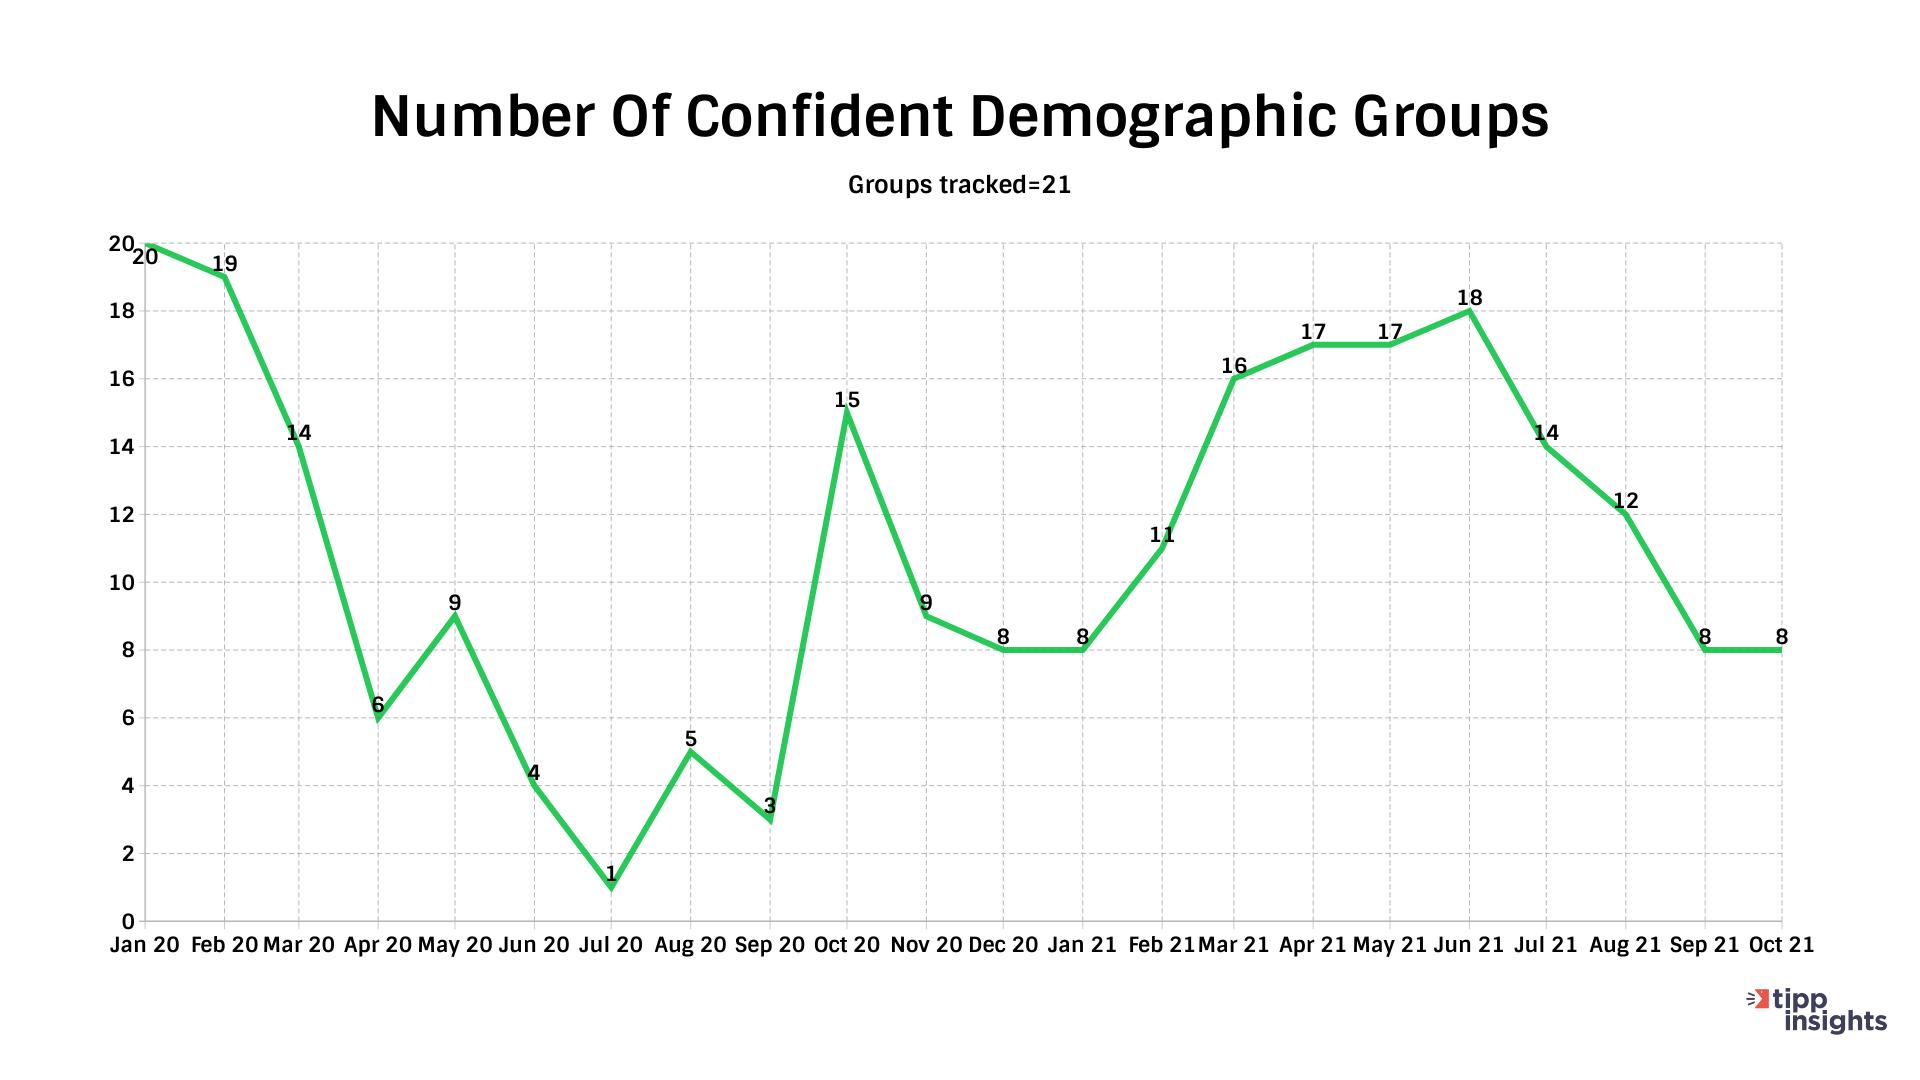 IBD/TIPP Economic Optimism number of demographic Groups Confident in U.S. Economy